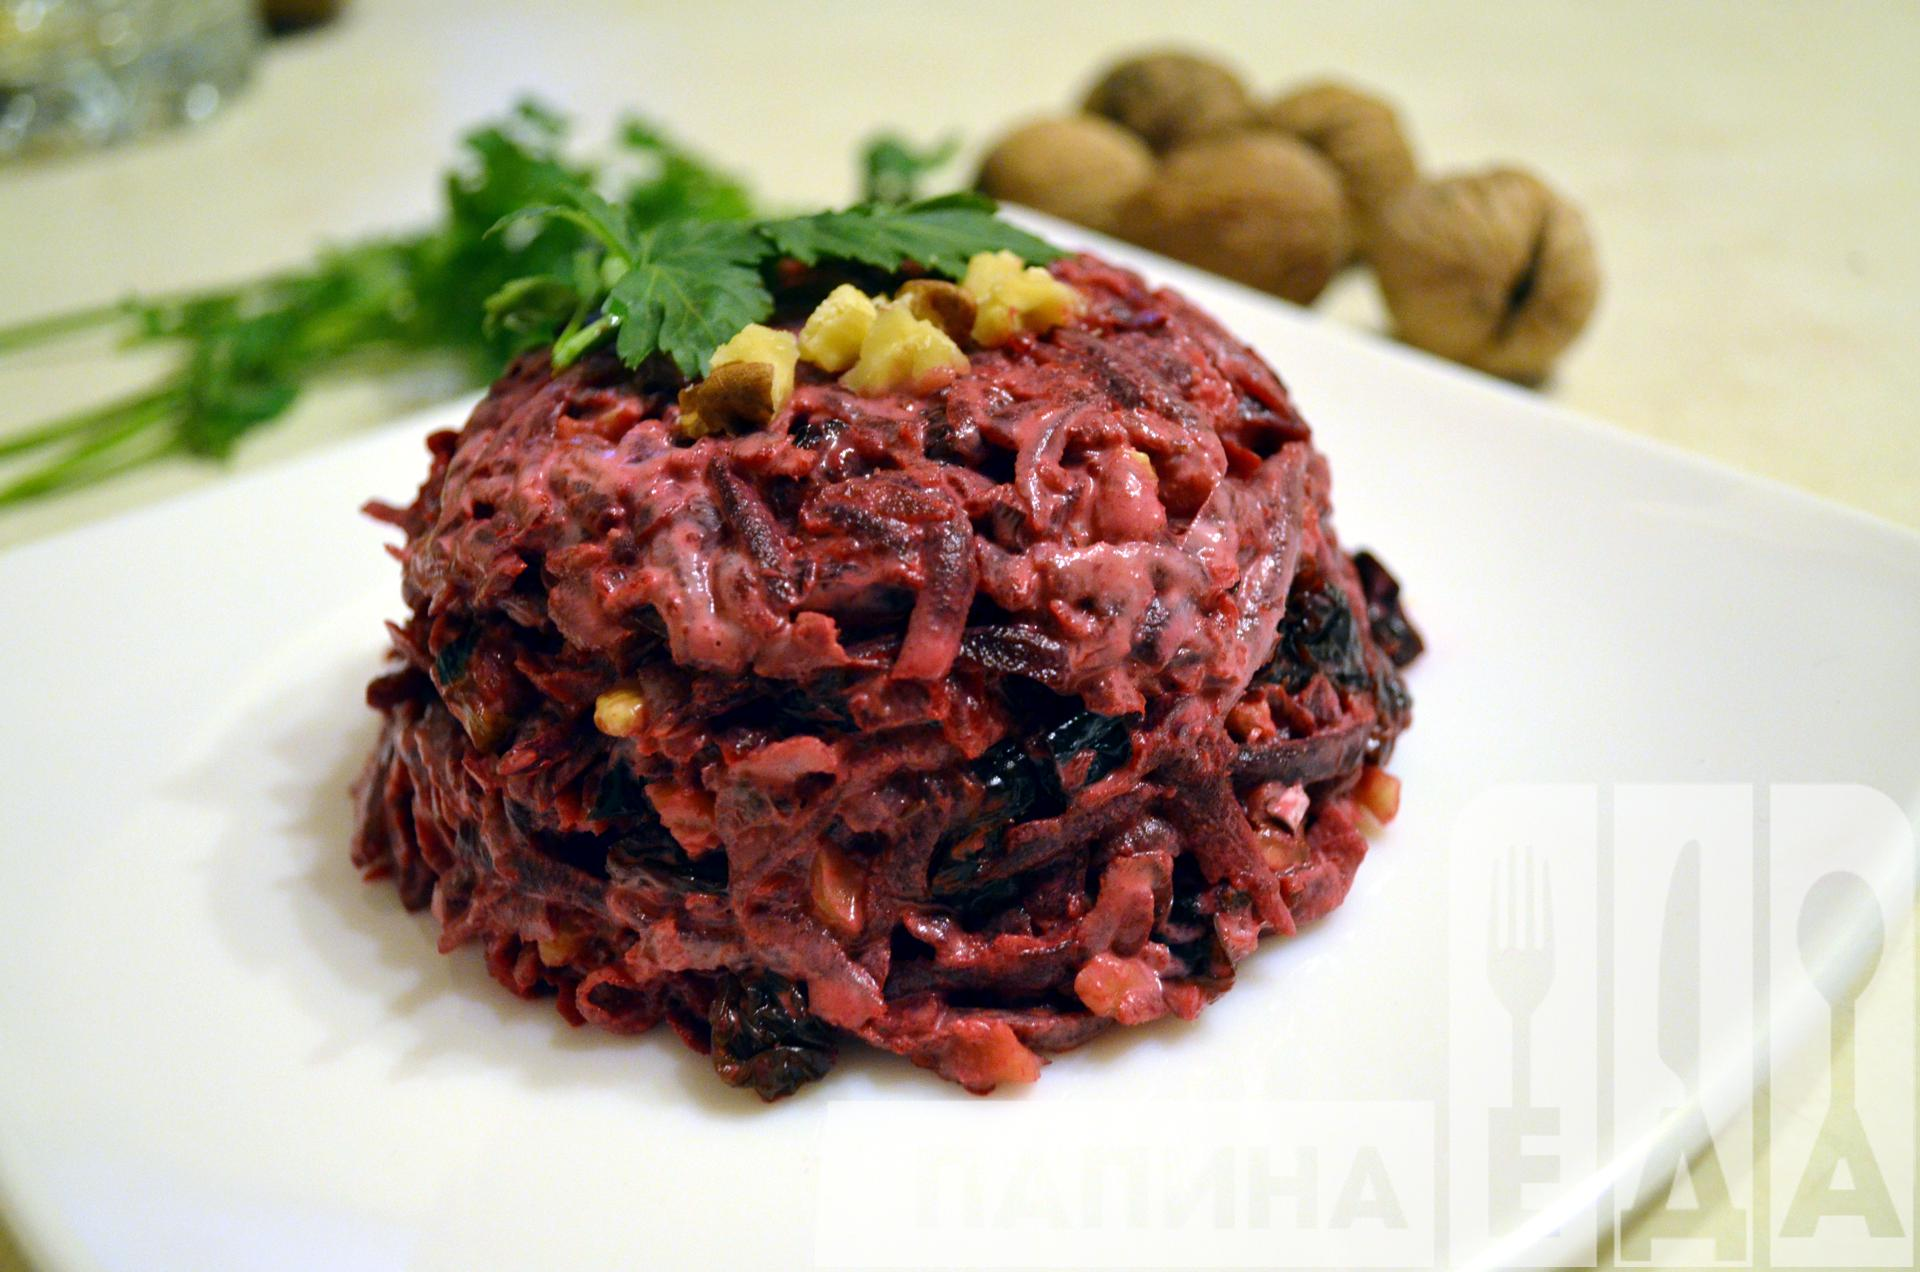 салат с черносливом фото рецепт